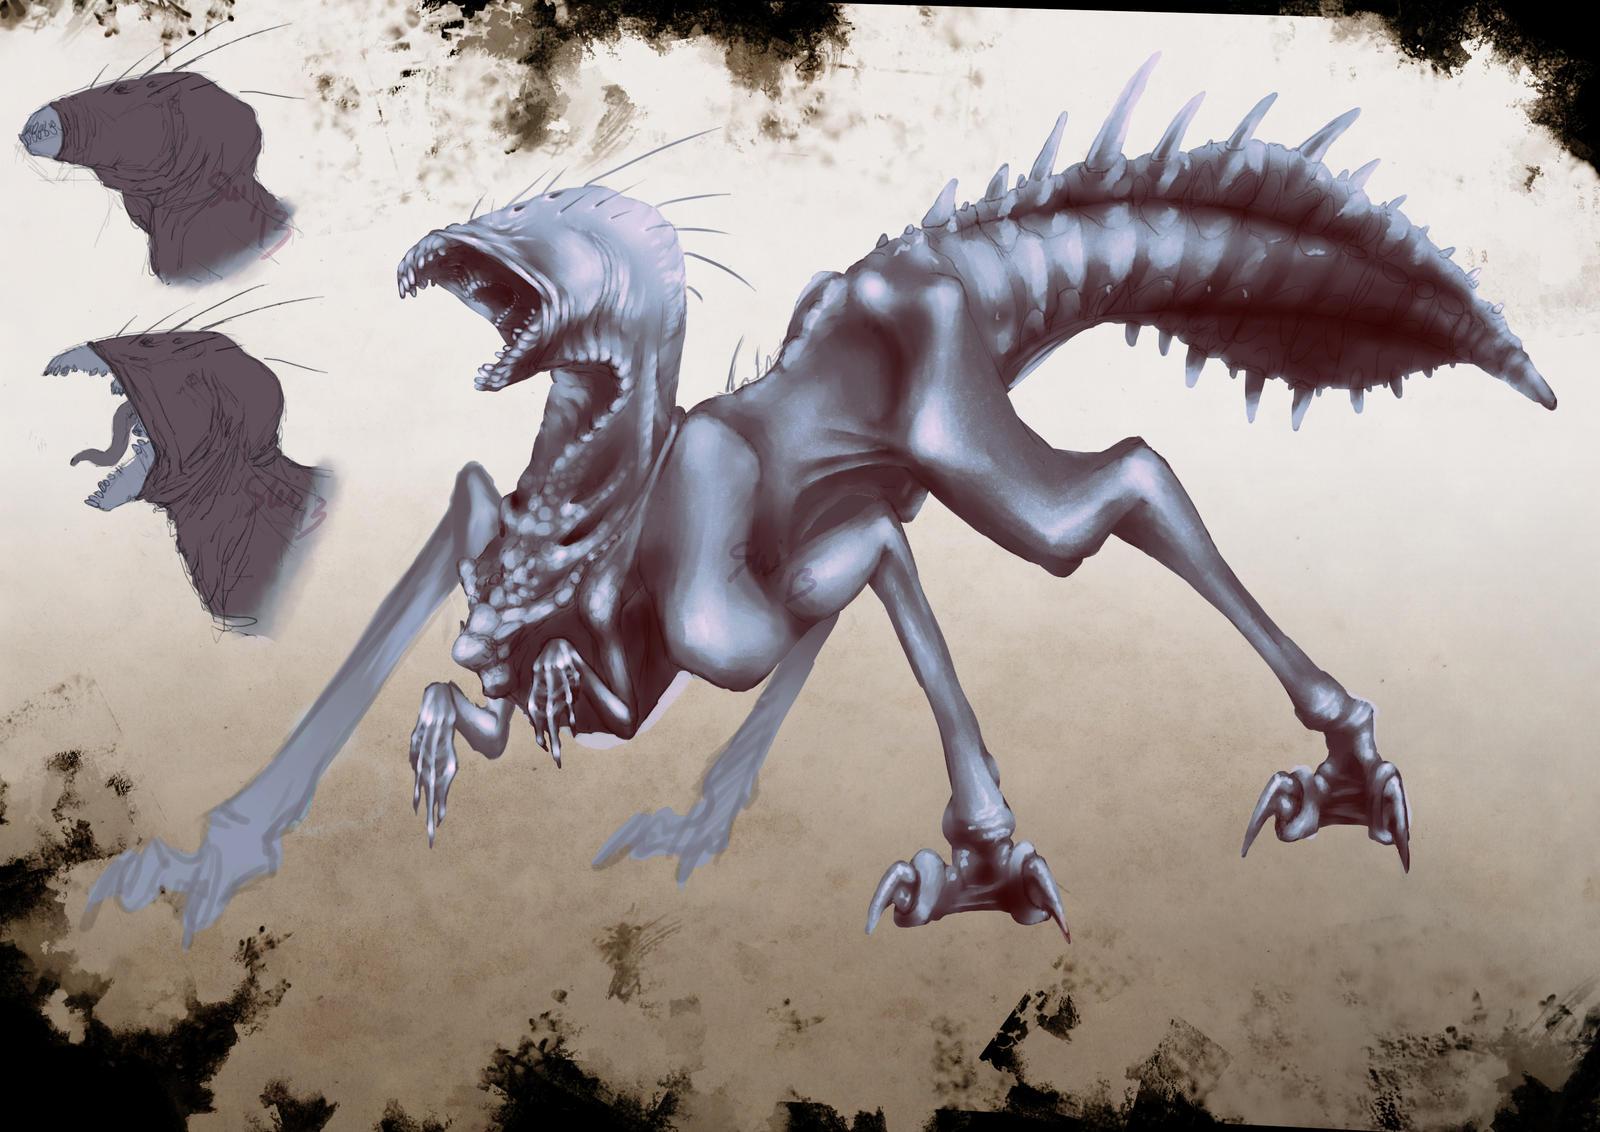 Monster Design_01 by SUIamena